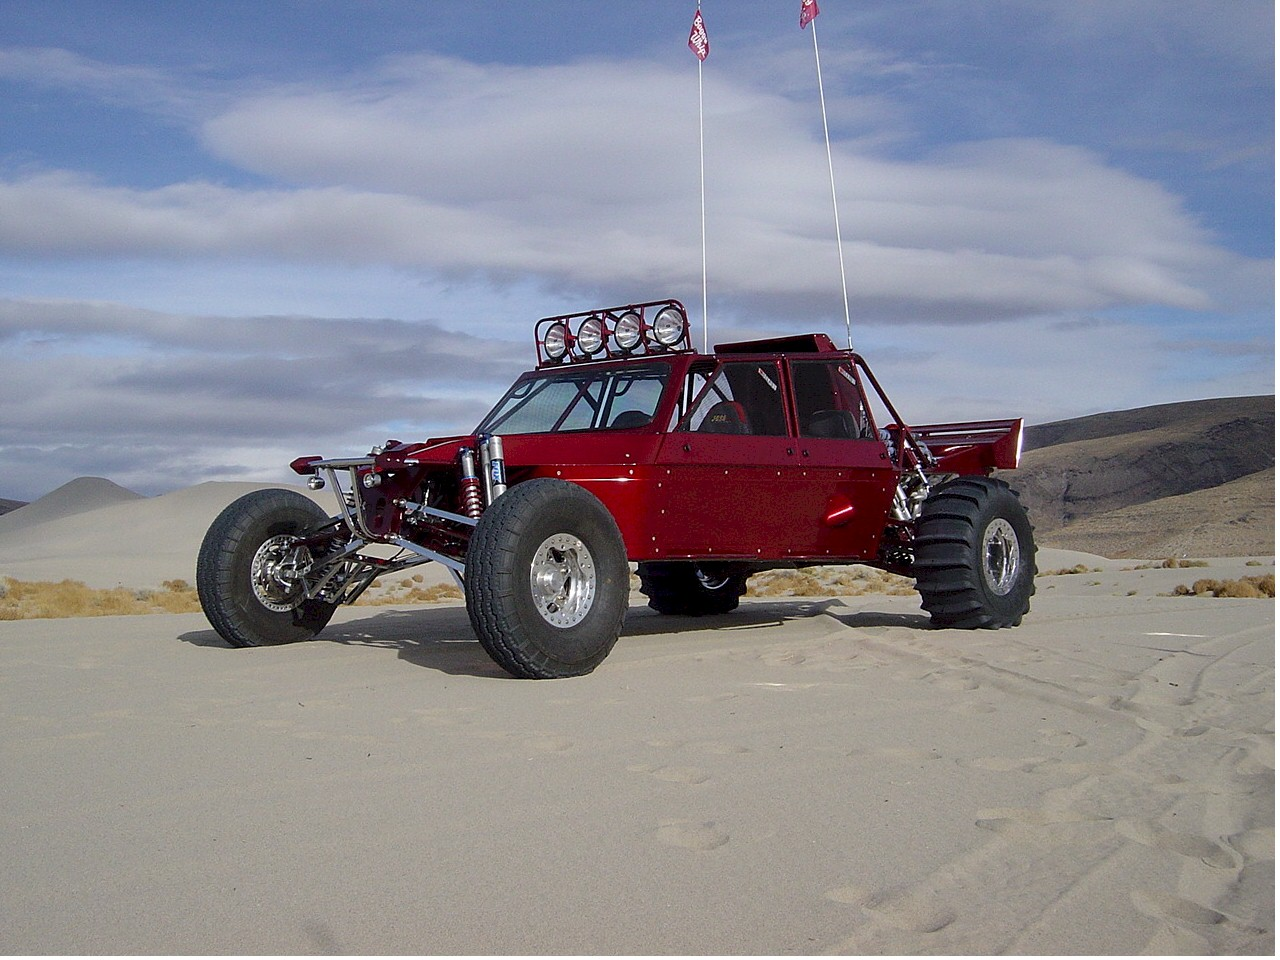 Ls1 Sand Rails : Predator sand car